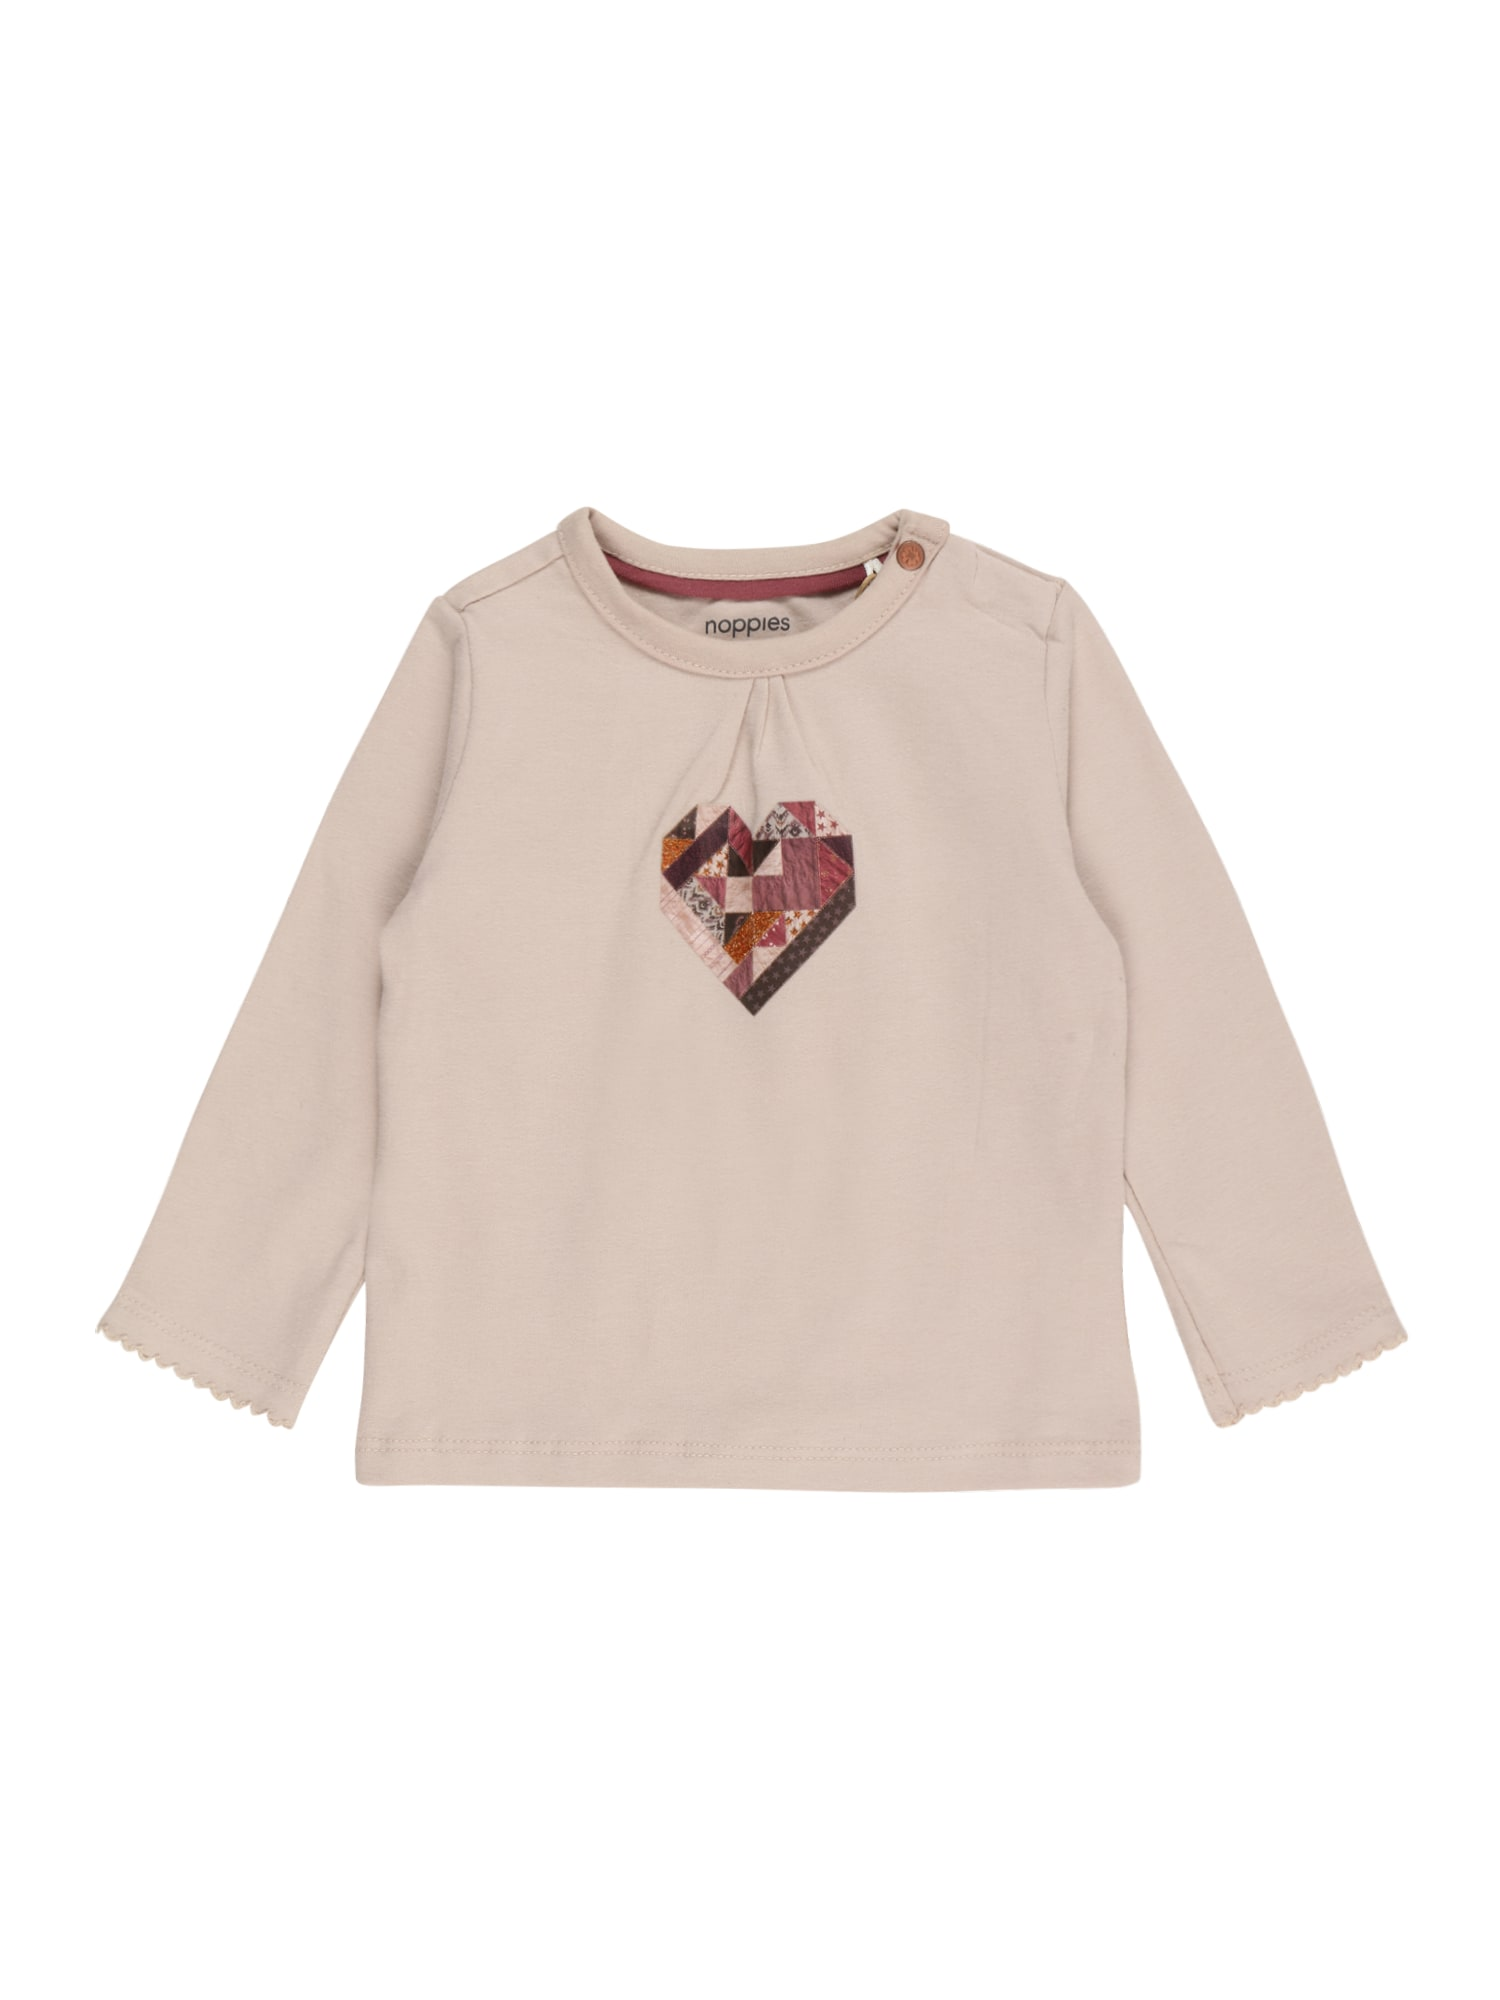 Noppies Tričko 'Sanford'  bílá / bordó / tmavě růžová / zlatá